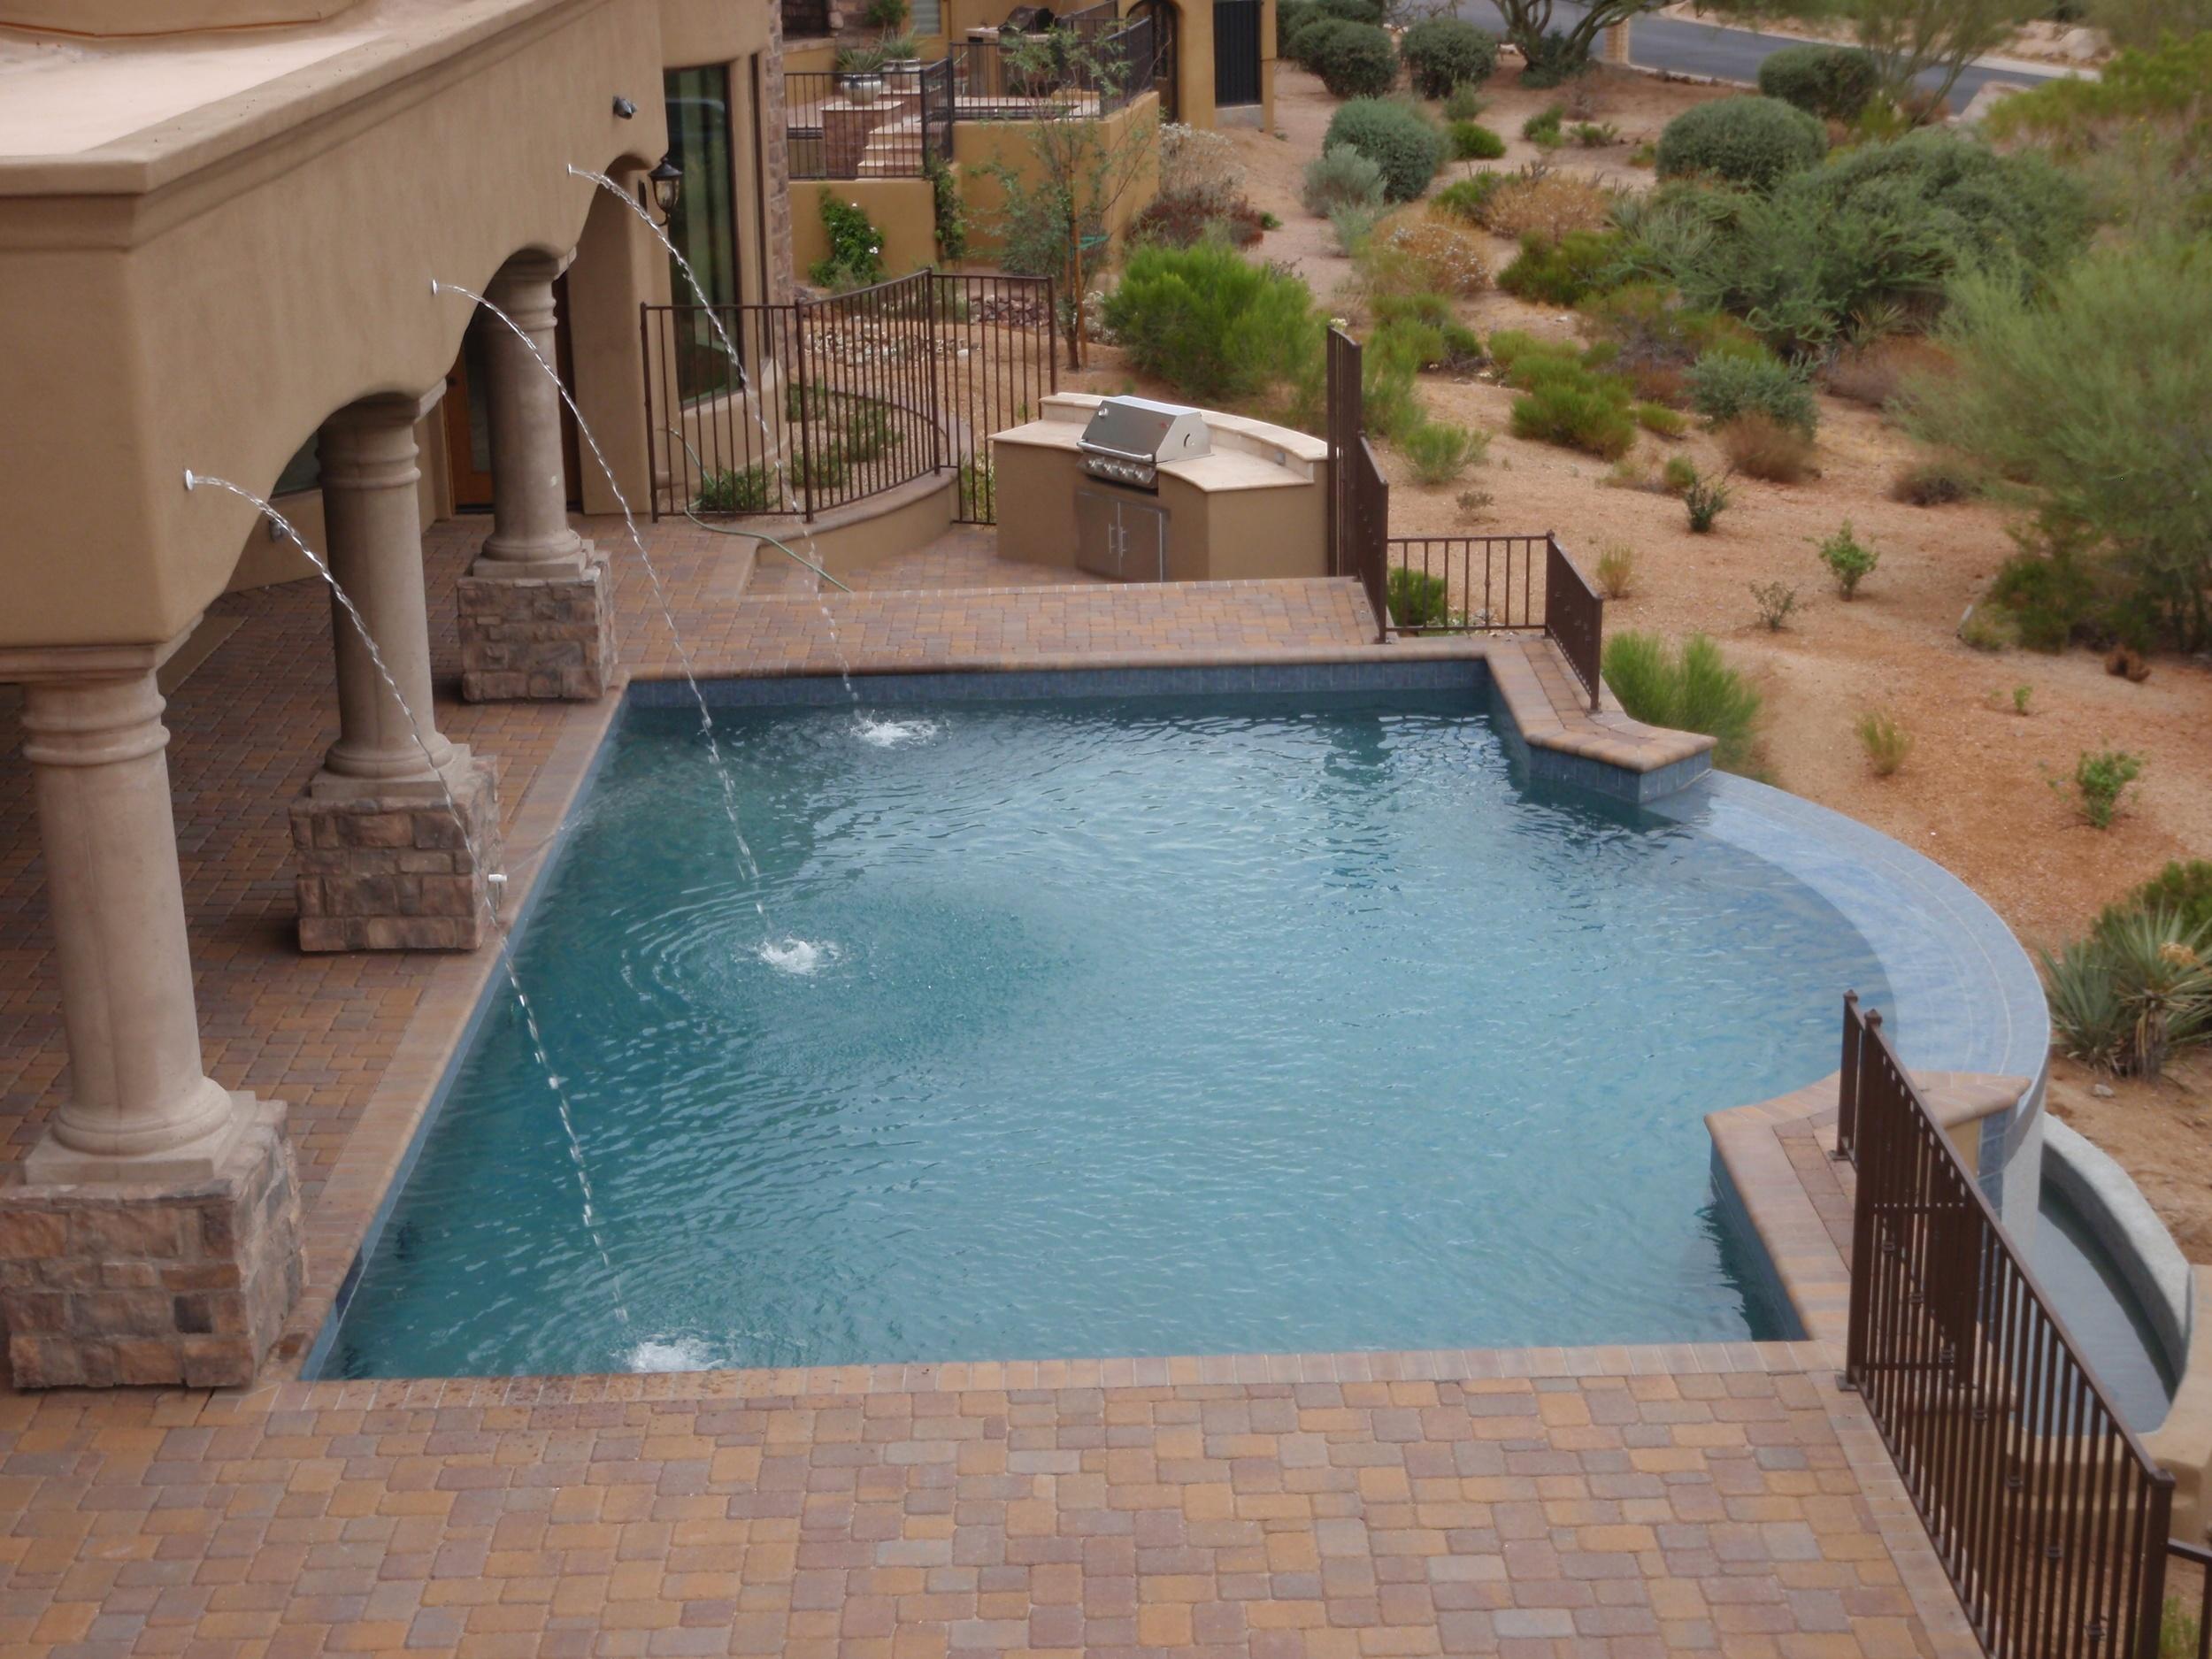 Choosing A Pool Shape